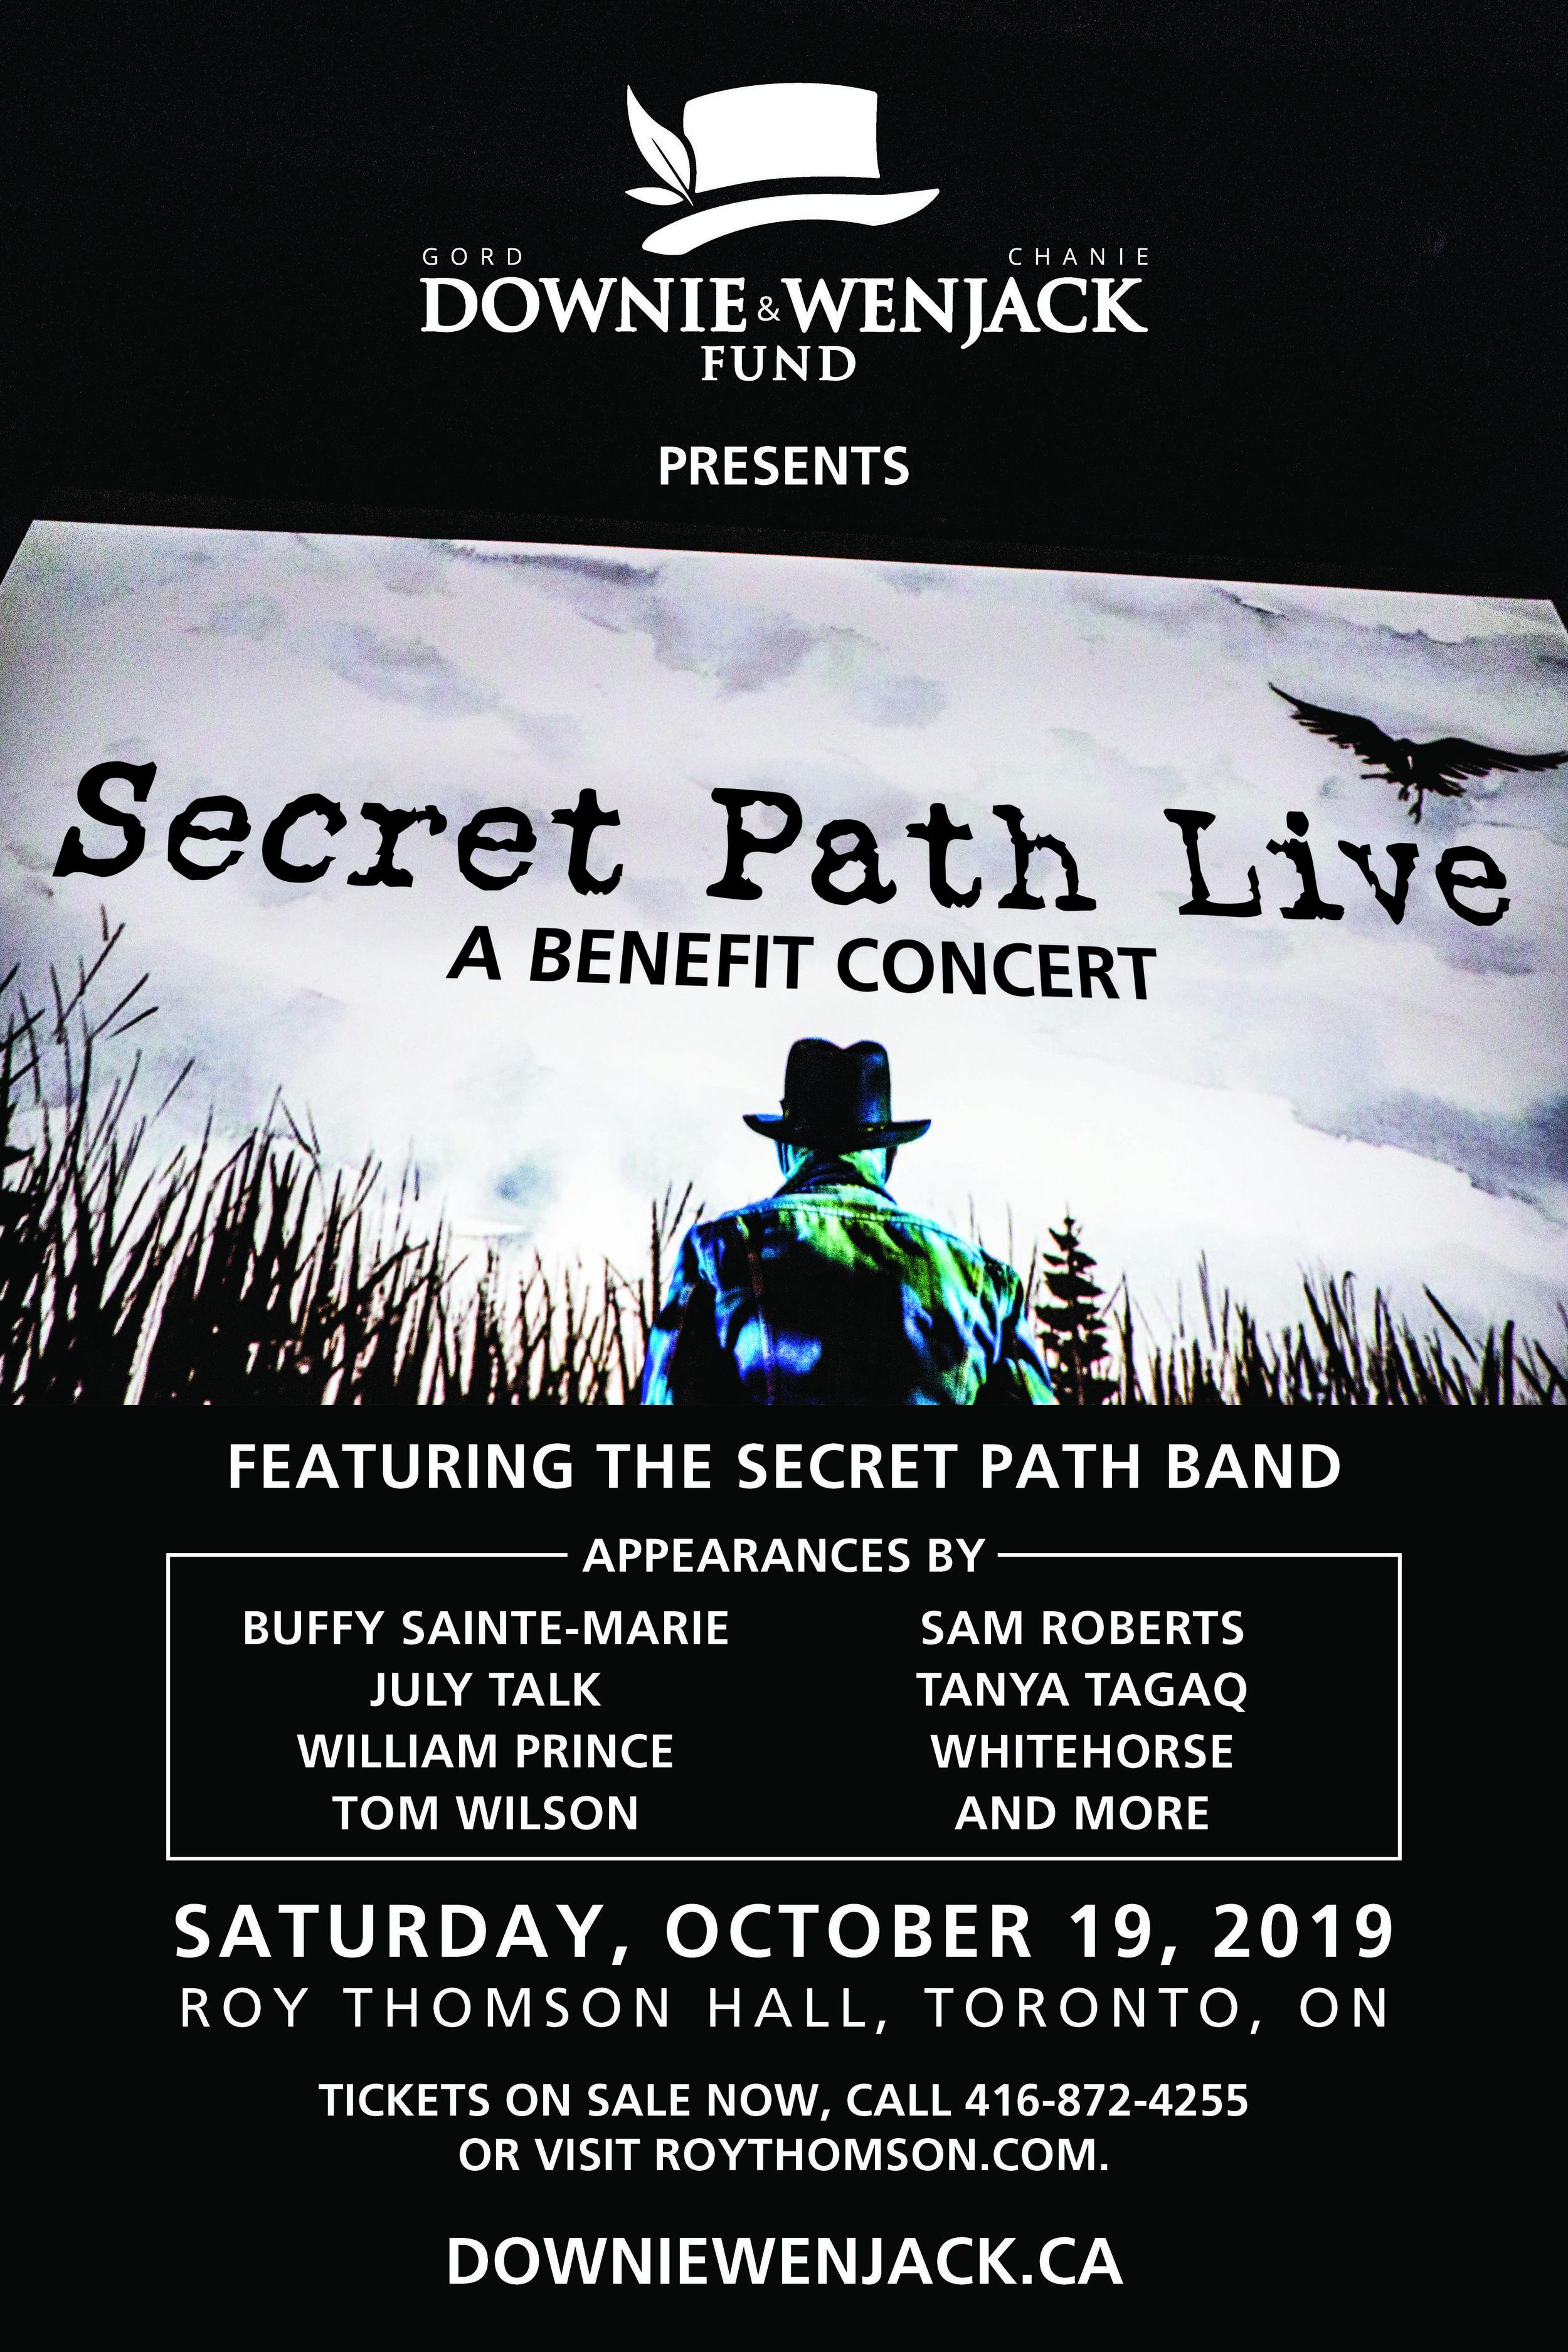 Secret Path Live Poster rev2 (002).jpg